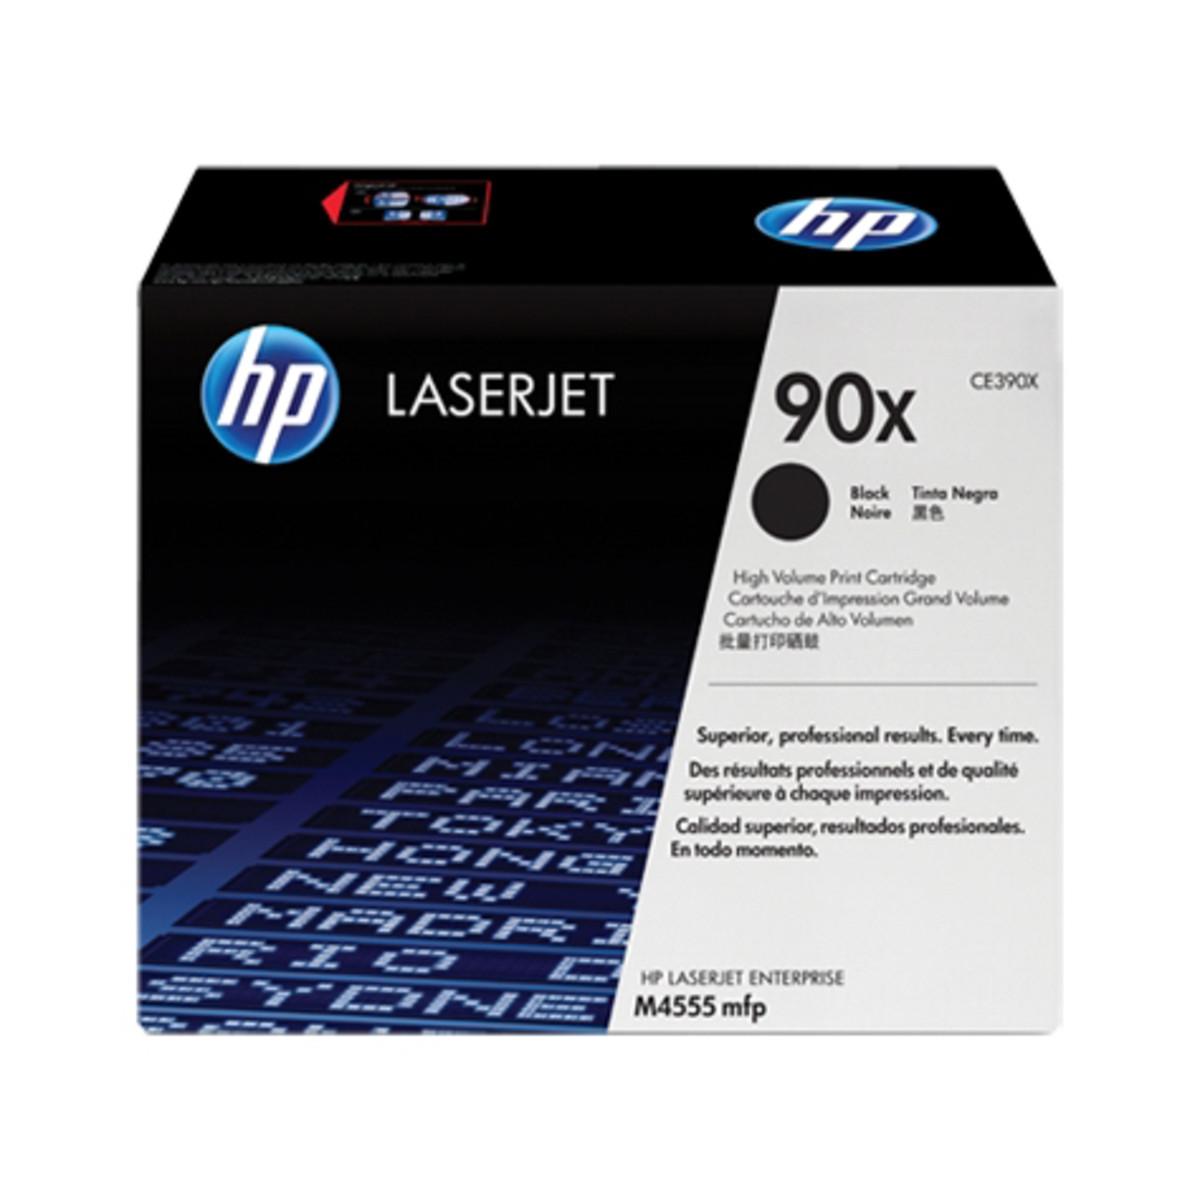 HP 90X (CE390X) Black Toner Cartridge - High Yield